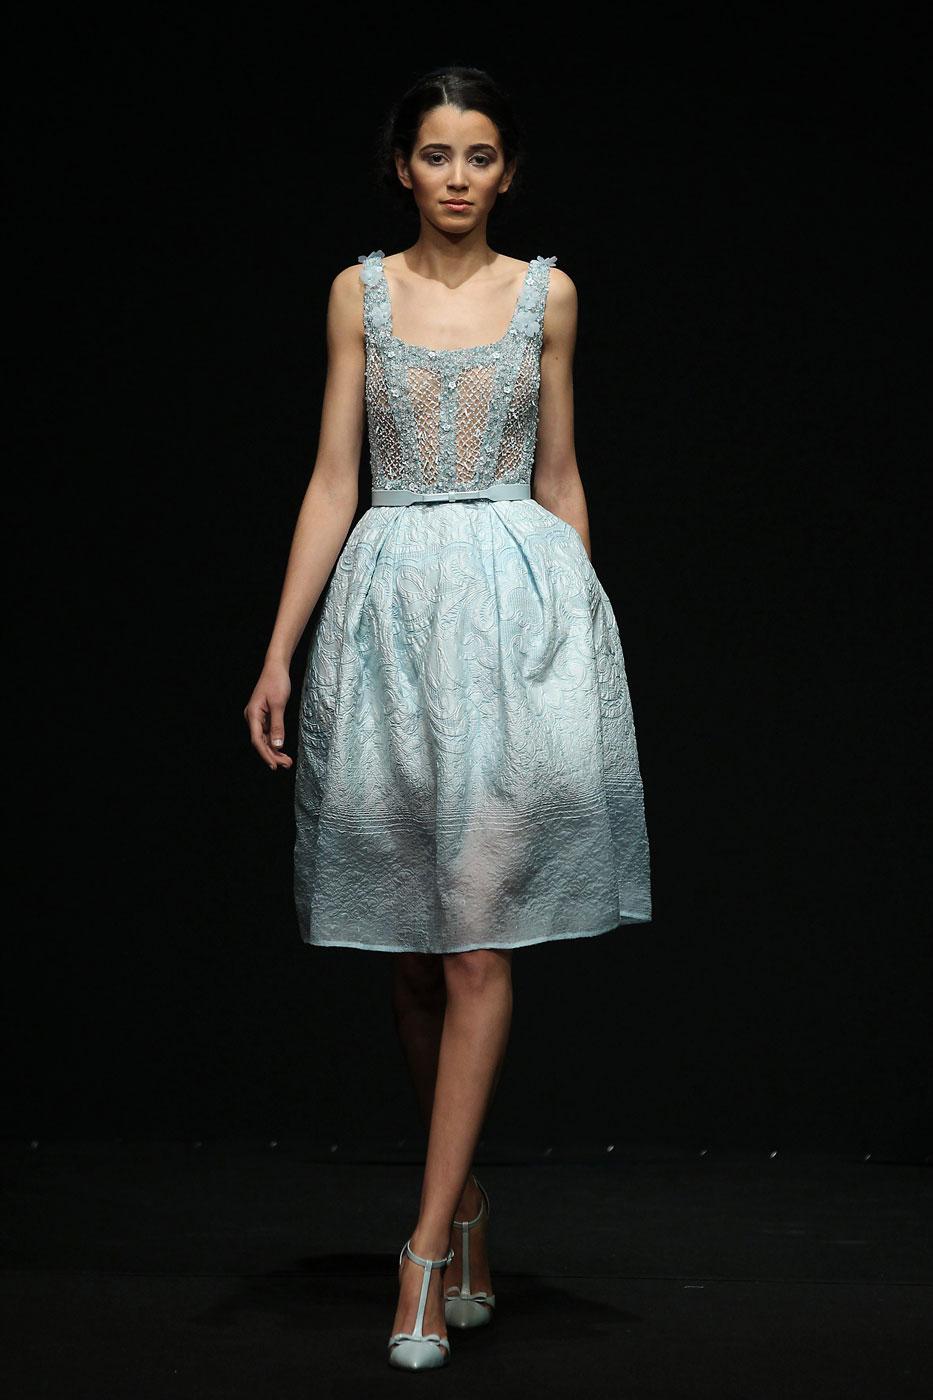 Abed-Mahfouz-fashion-runway-show-haute-couture-paris-spring-2015-the-impression-05